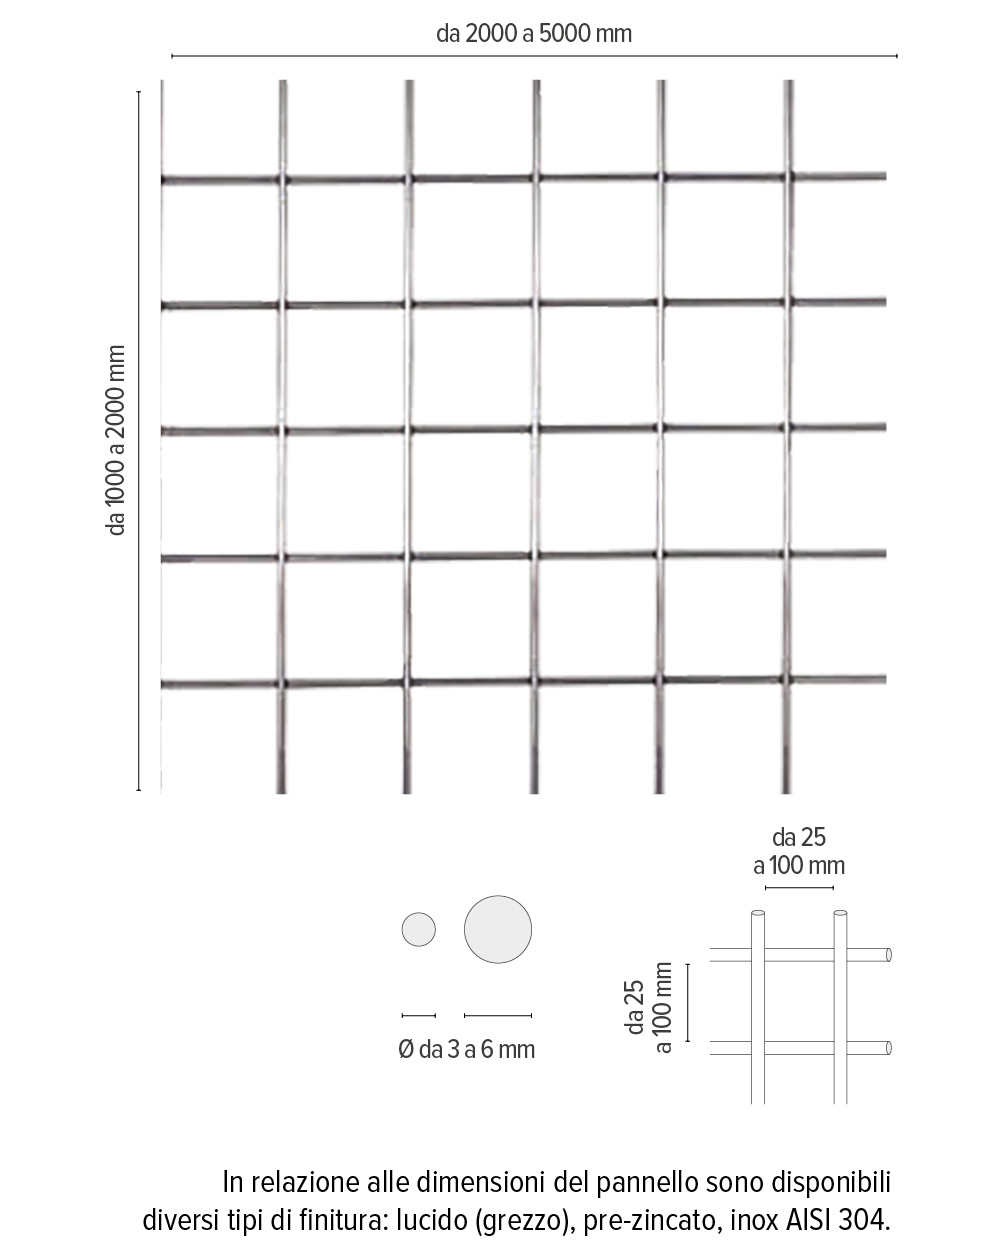 Defim std - info tecniche